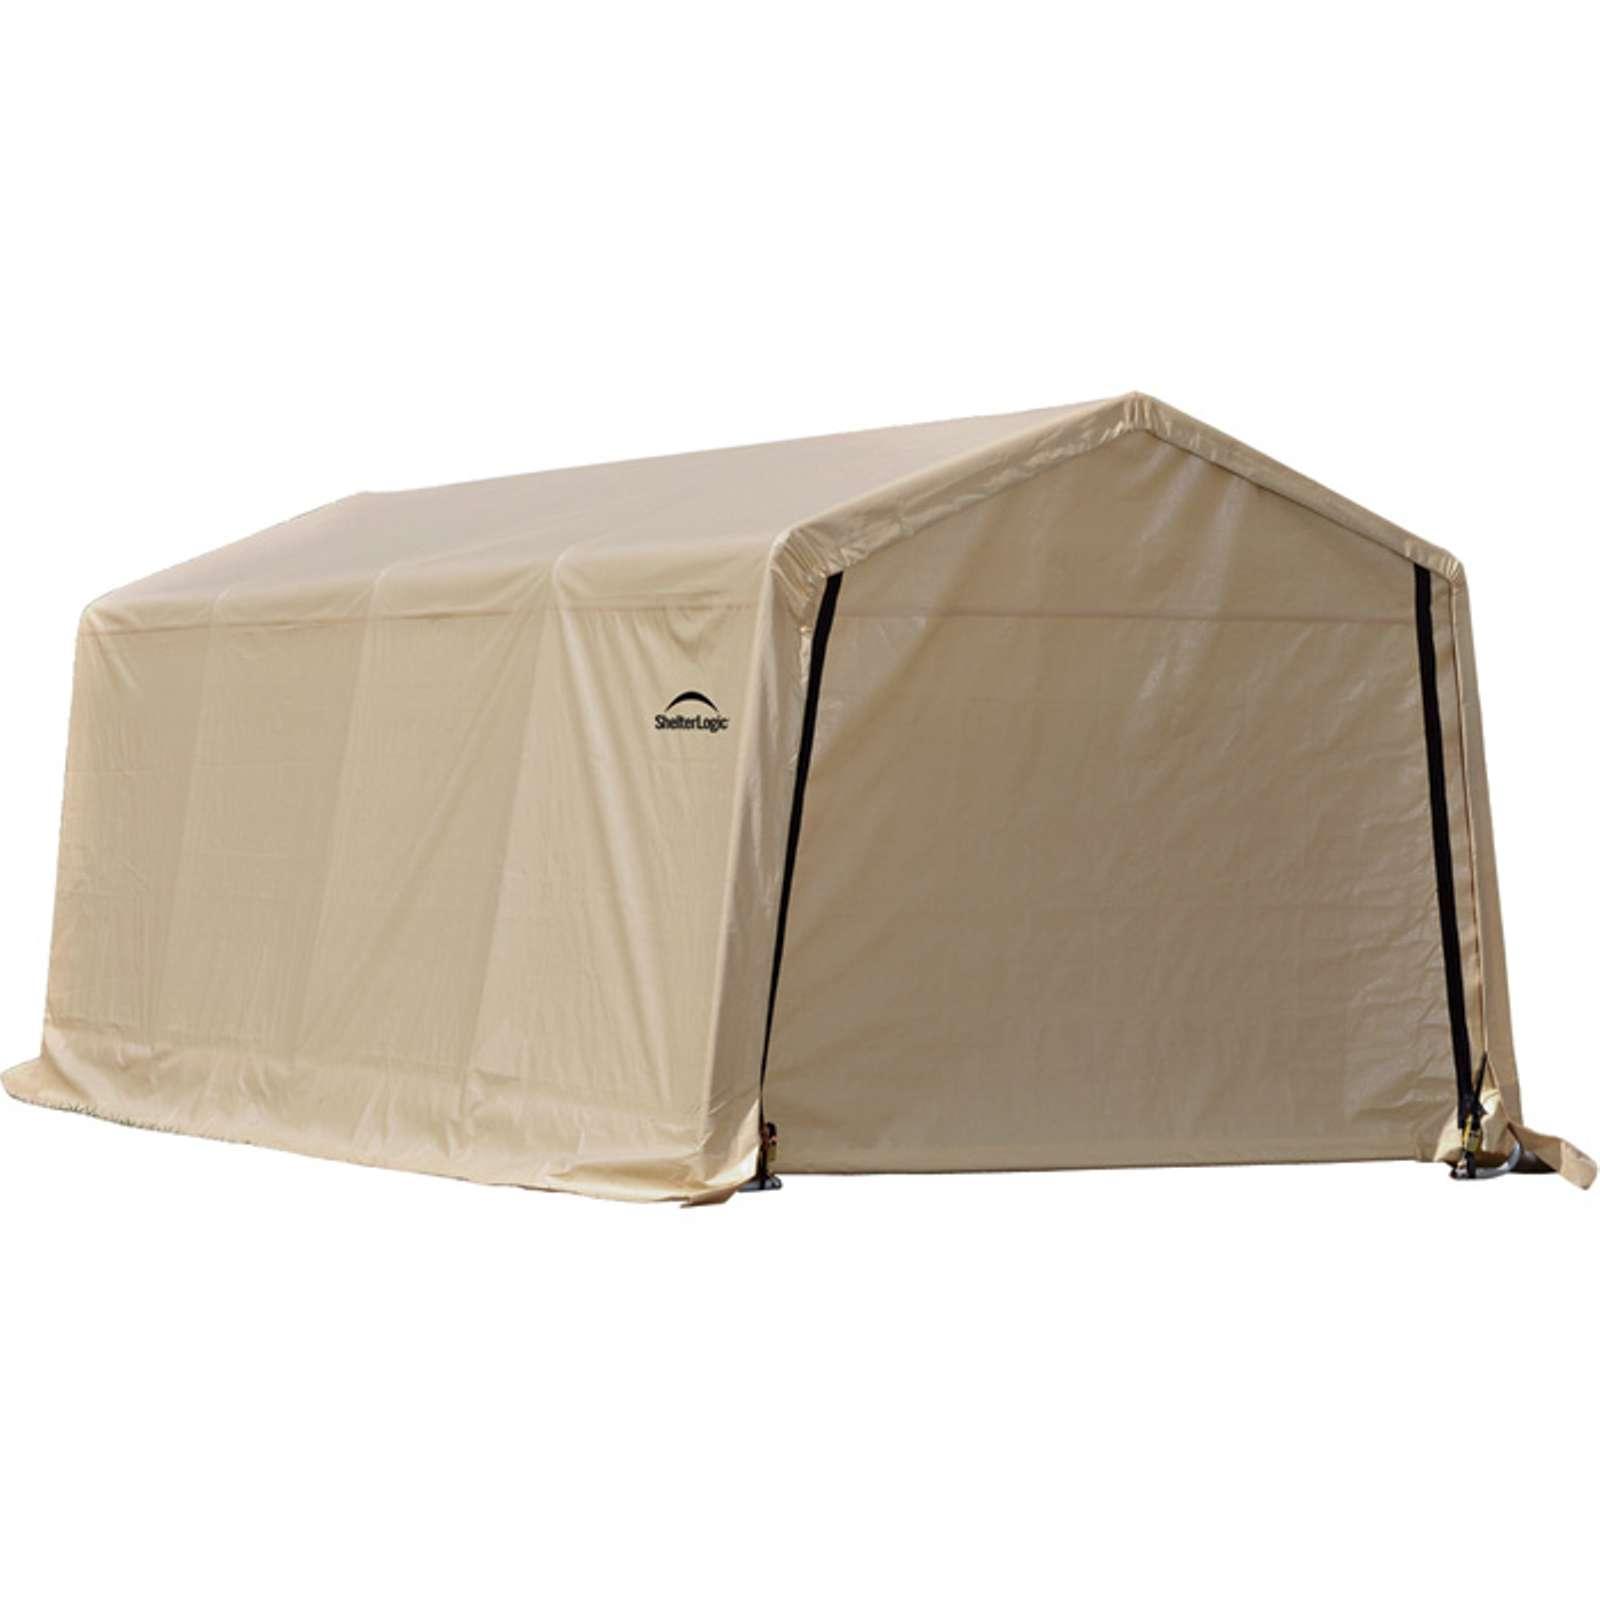 Гараж в коробке ShelterLogic 3x6,1x2,4м